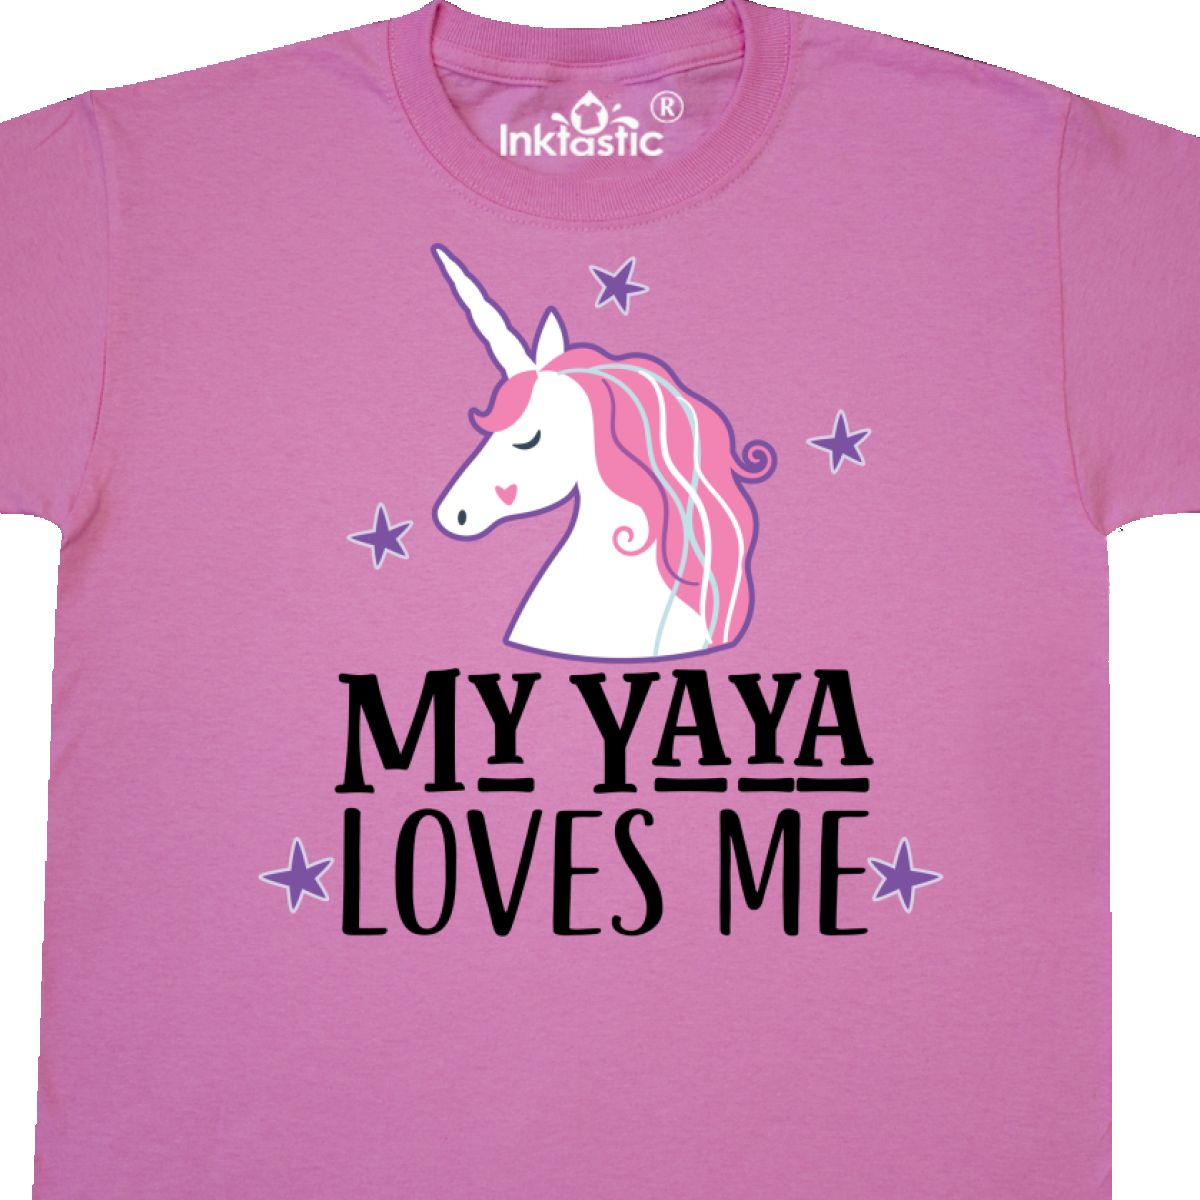 Inktastic My Yaya Loves Me Unicorn Youth T-Shirt Grandchild Childs Clothing Baby